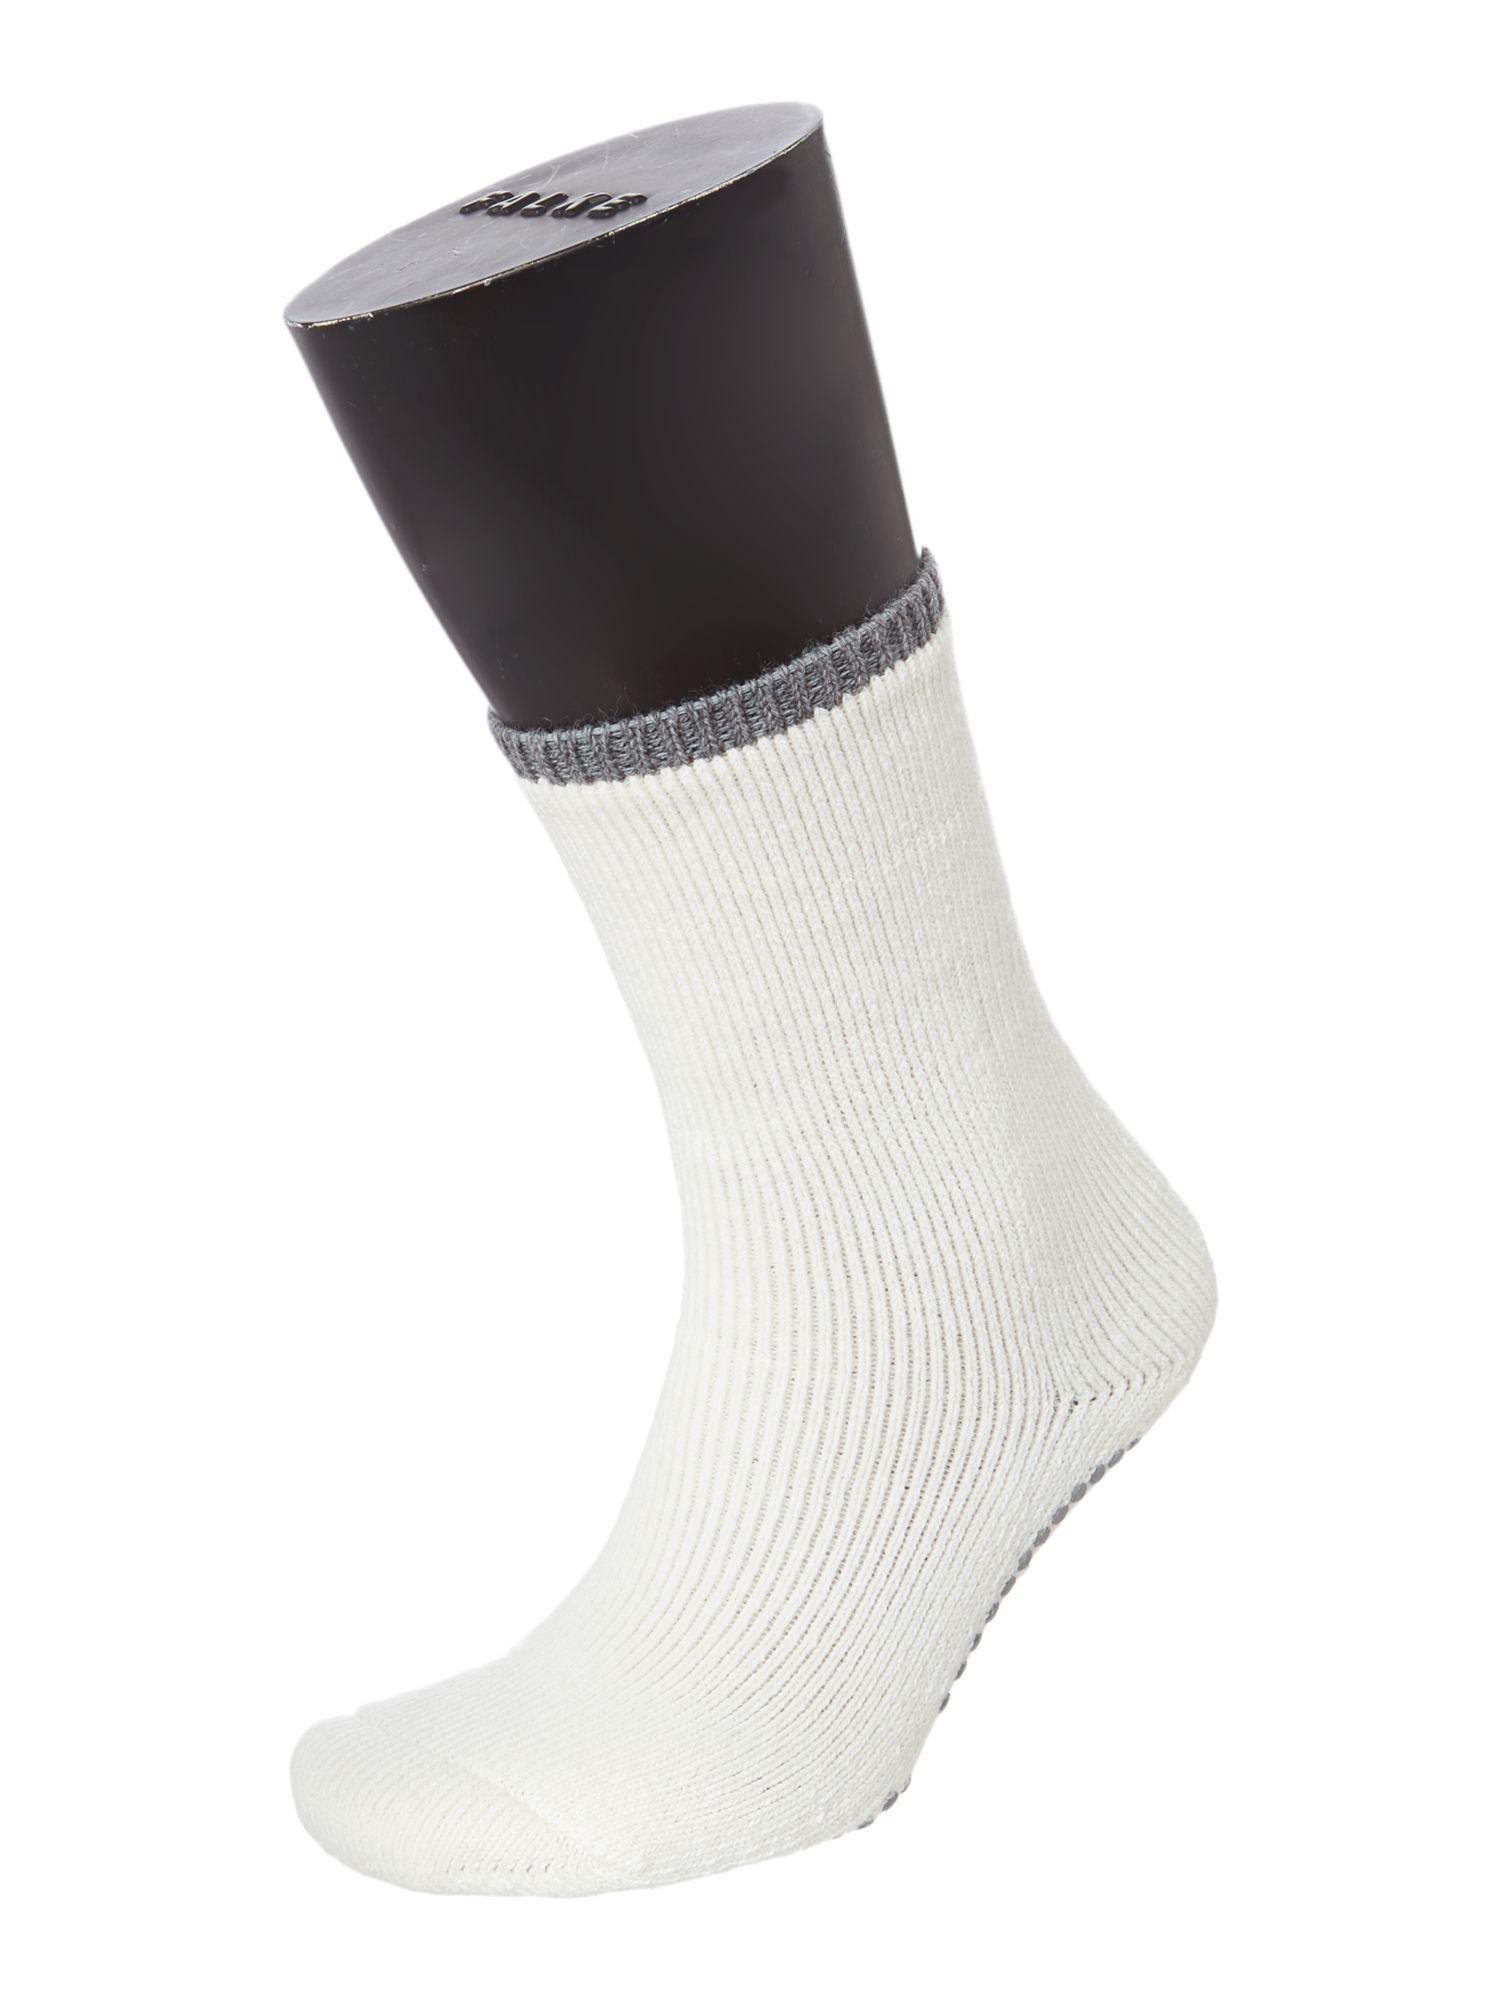 Lyst - Falke Cuddle Pad Slipper Socks In White